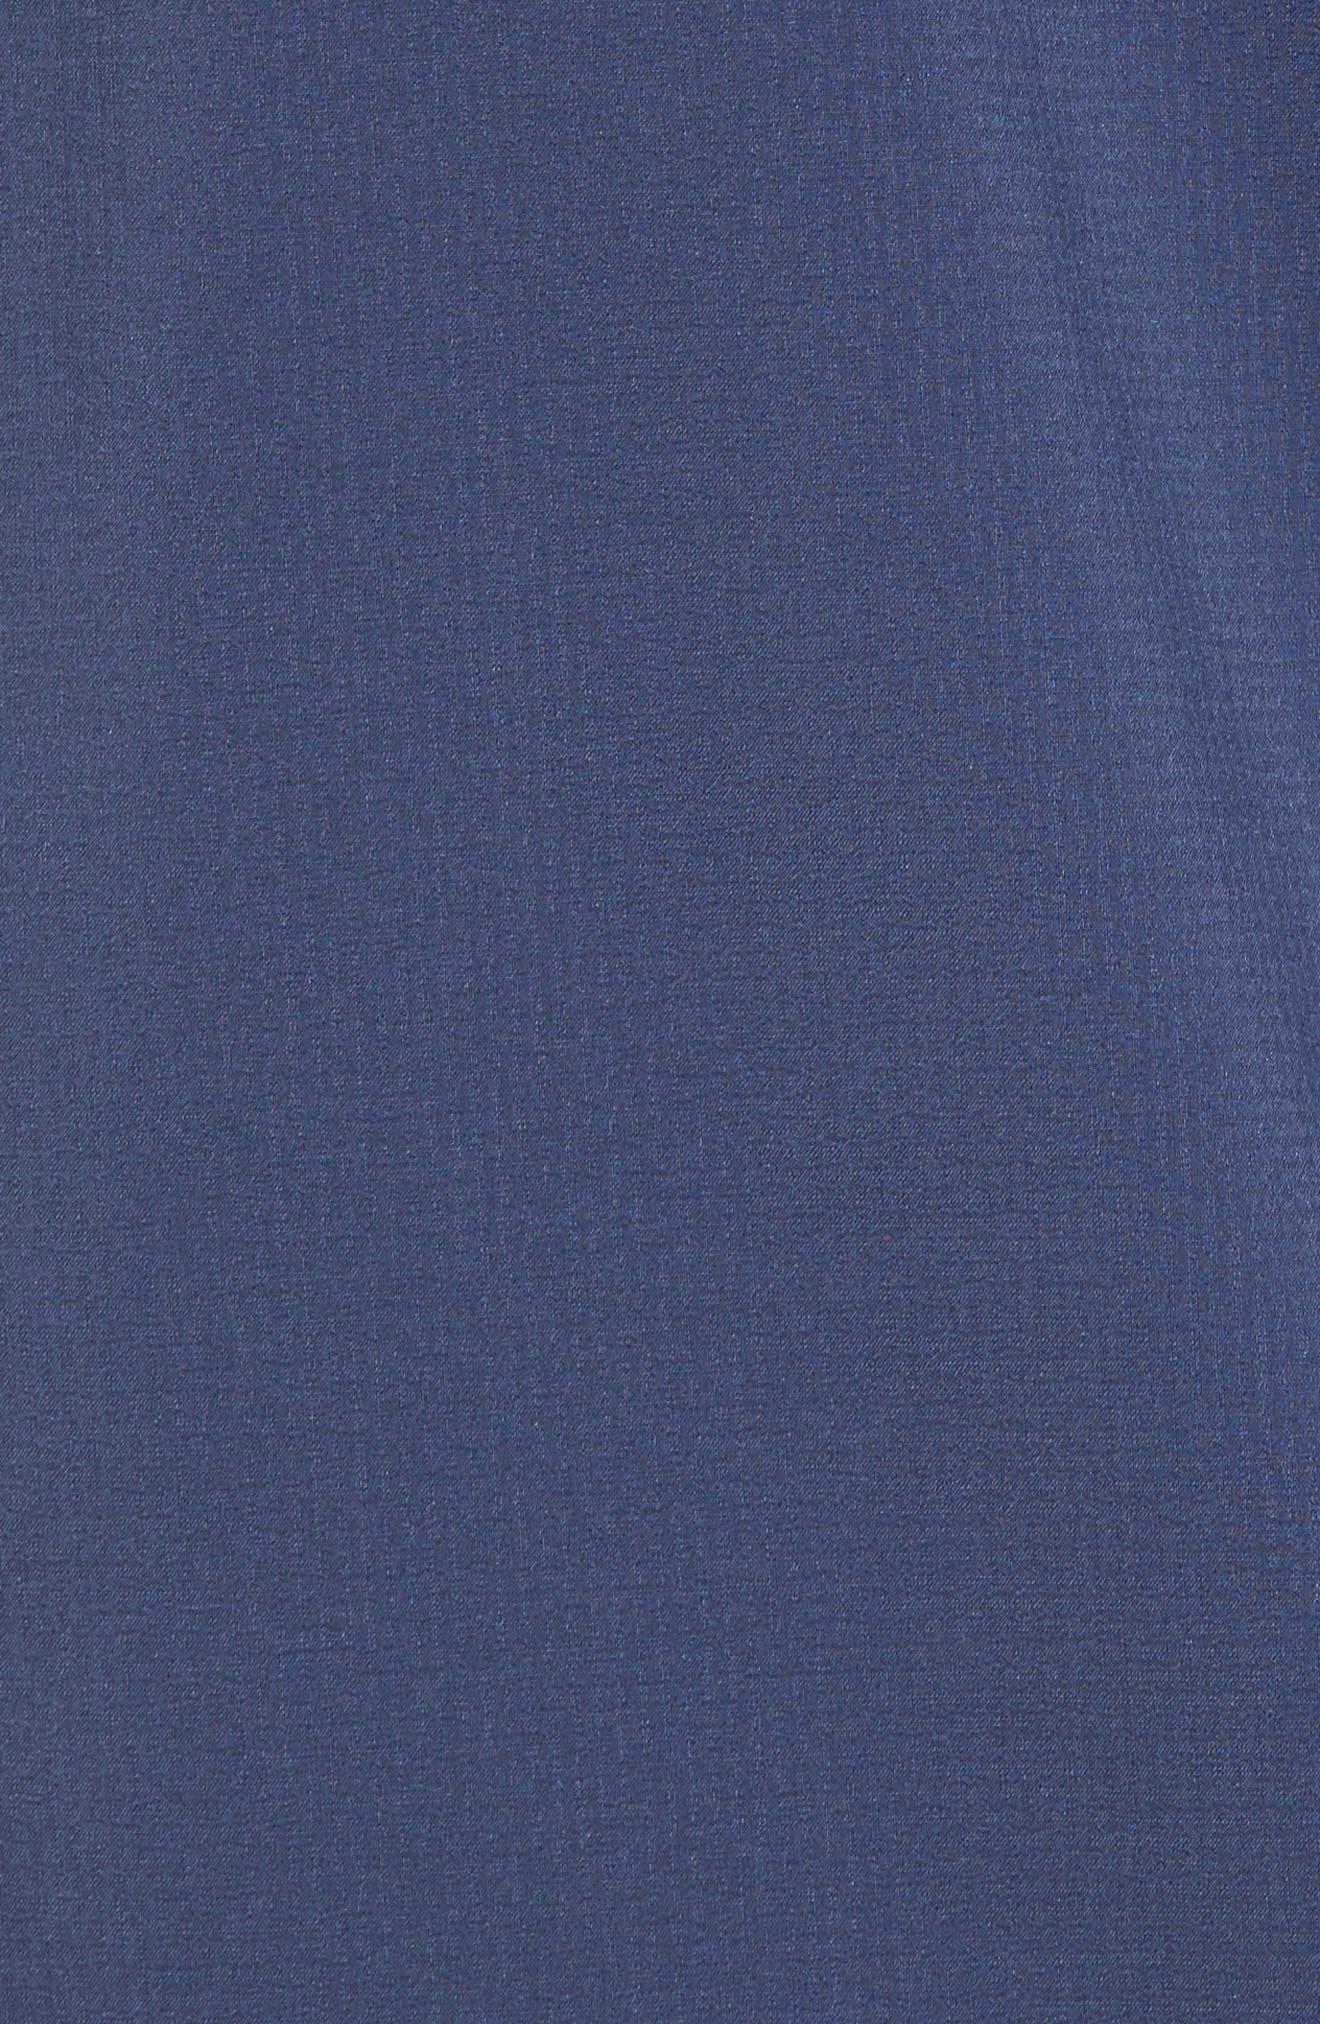 Stretch Rainshadow Jacket,                             Alternate thumbnail 5, color,                             Dolomite Blue